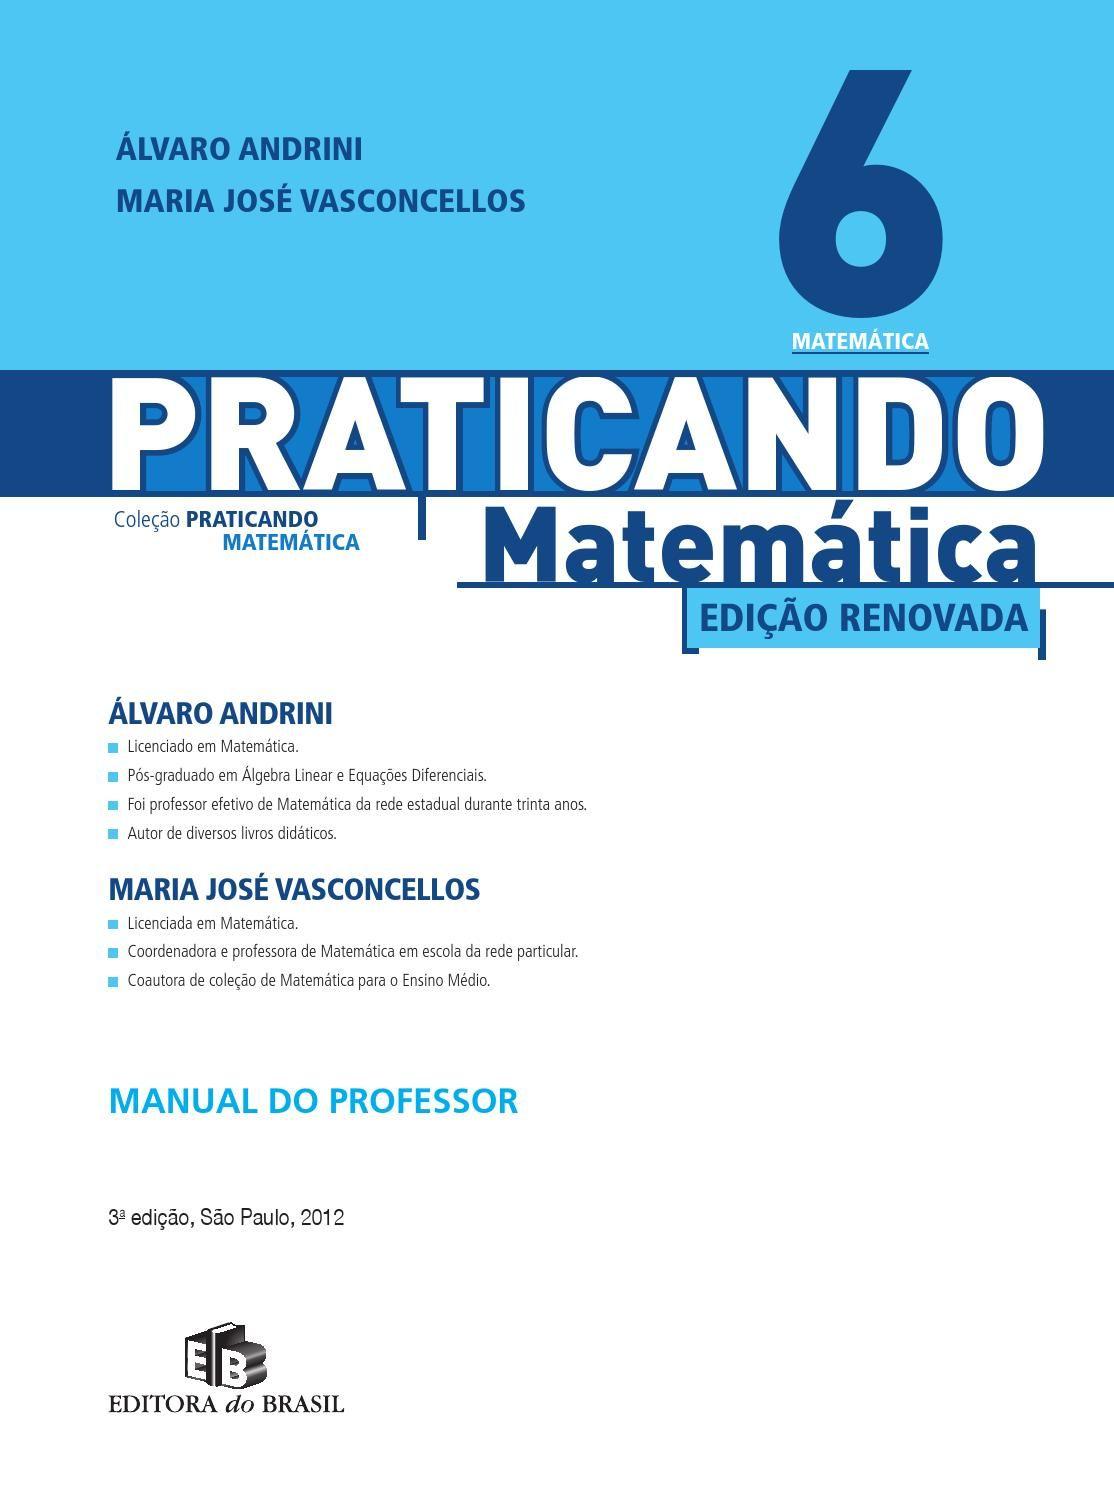 Praticando Matematica 6ano Cadernos De Matematica Matematica Pdf